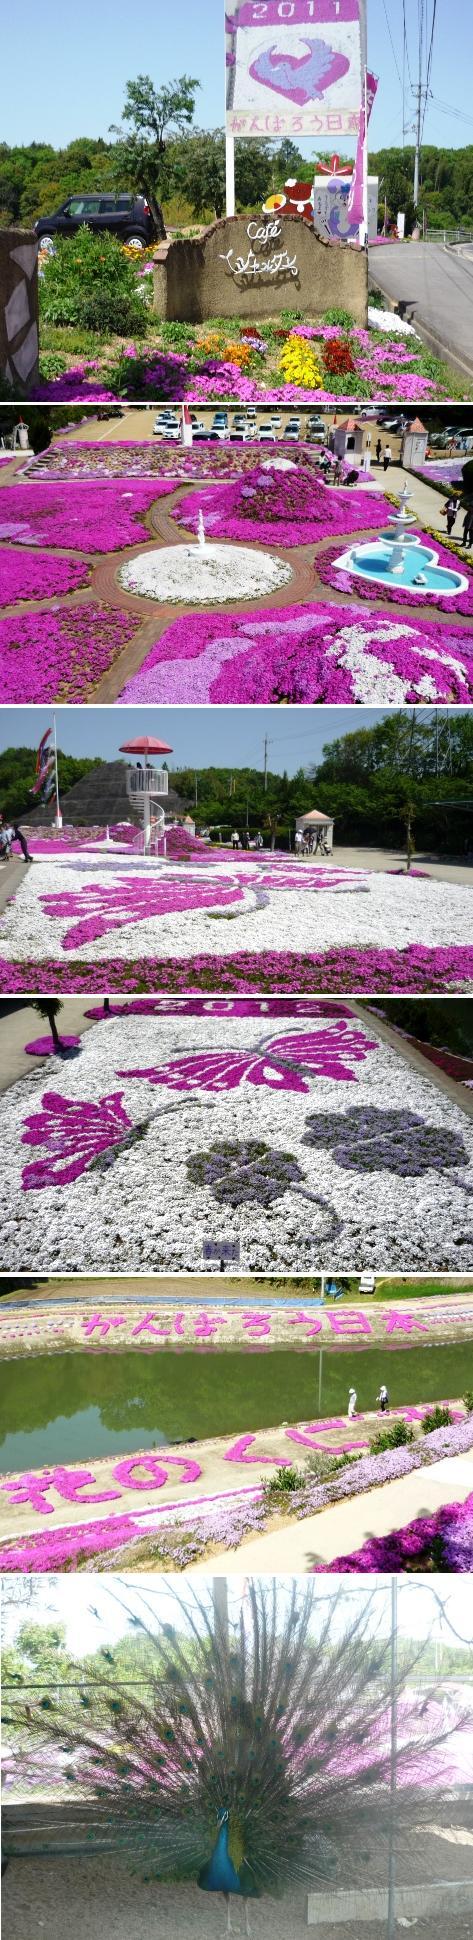 a芝桜 ジャルダン